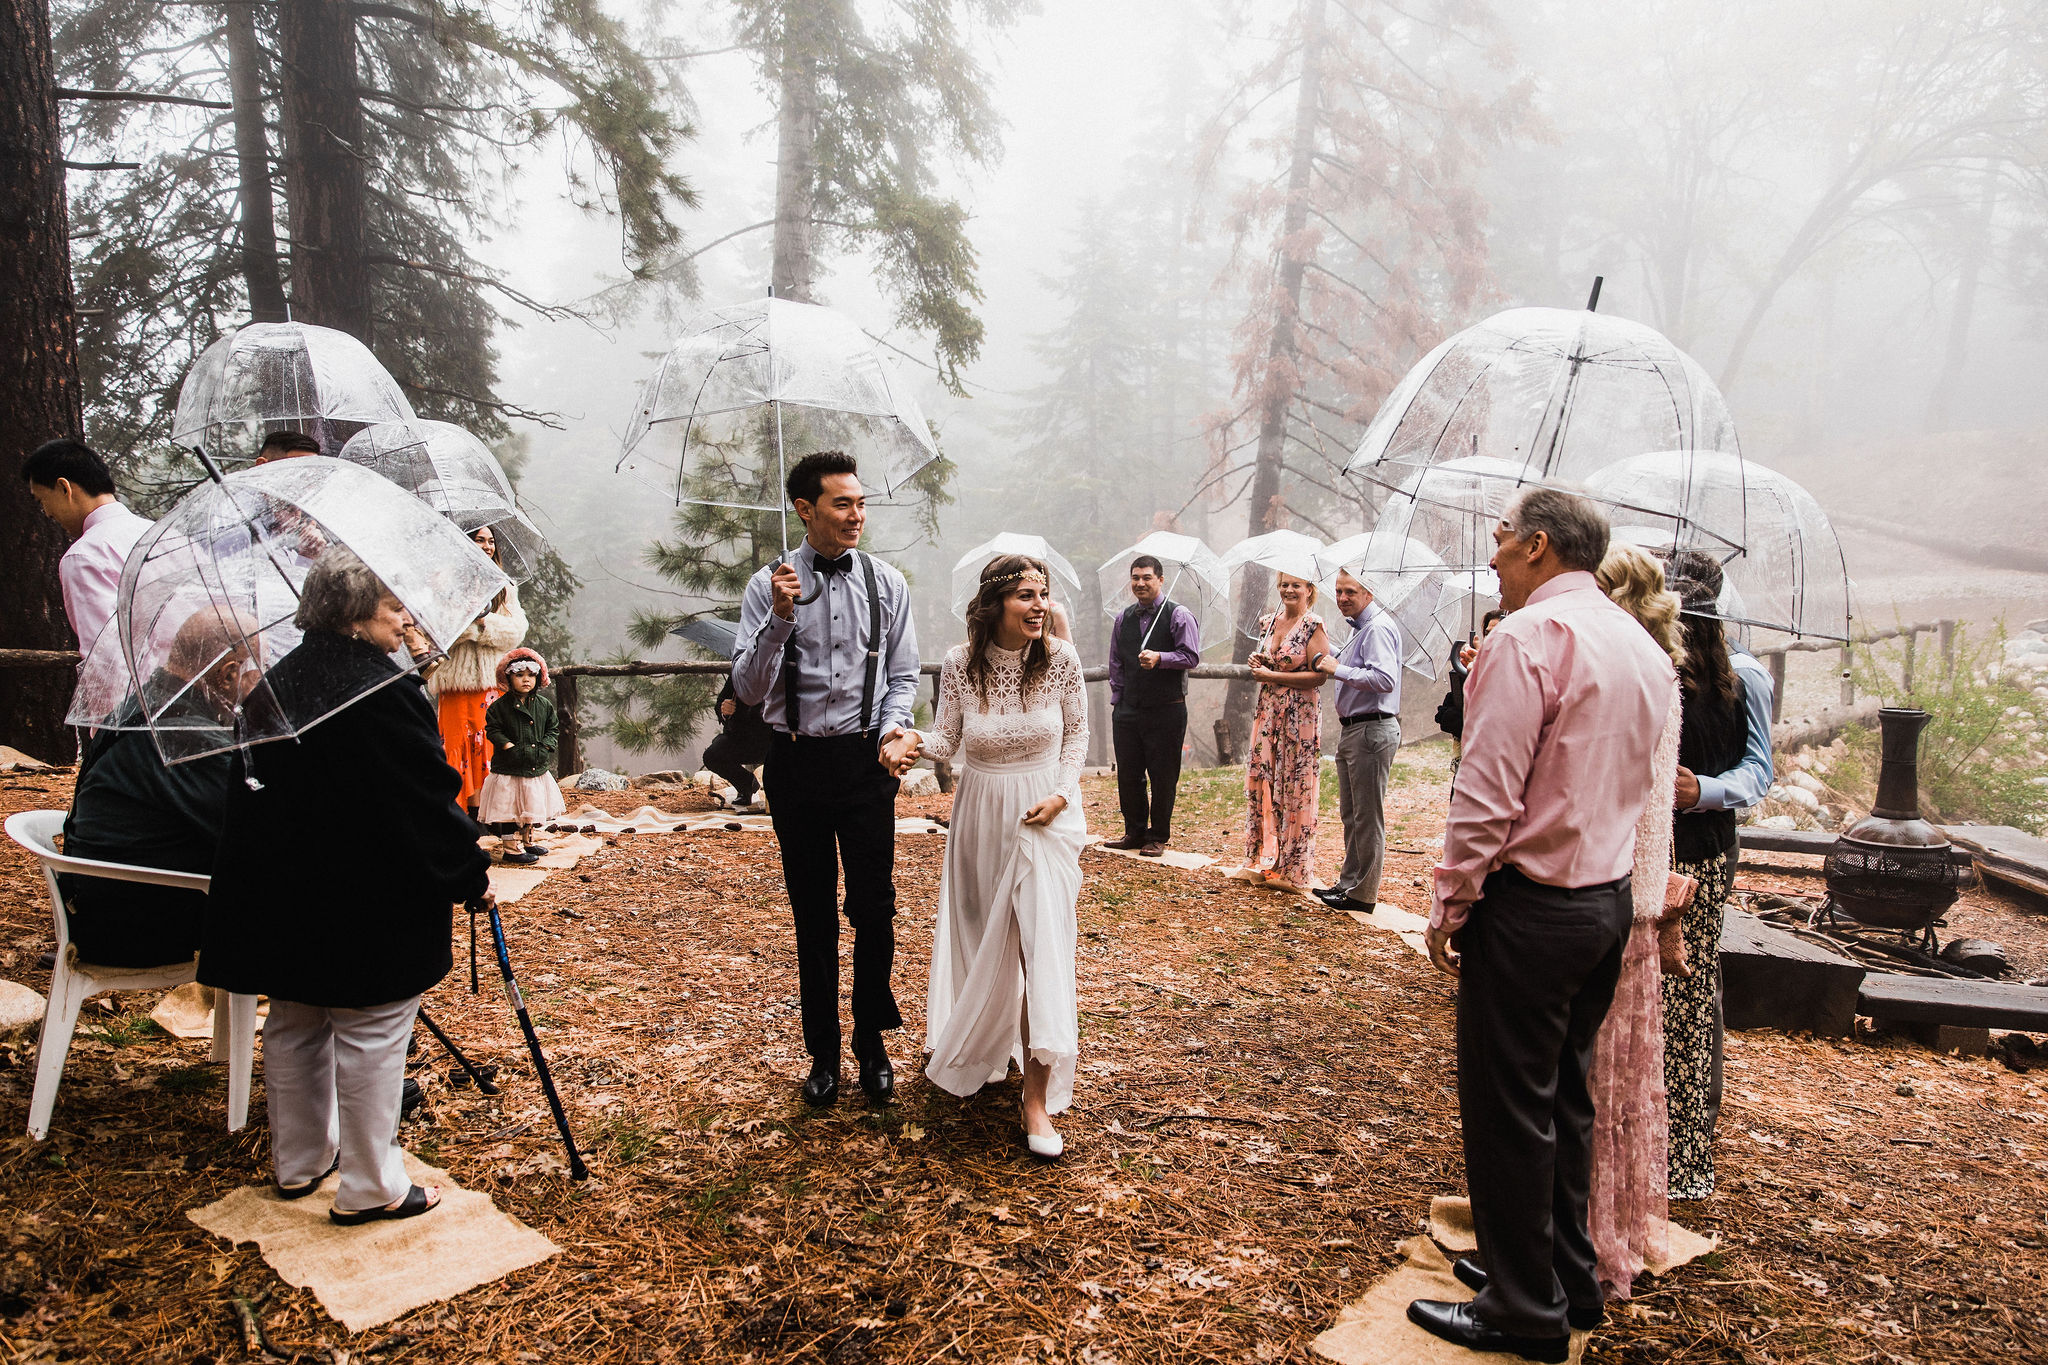 Rainy-Forest-Elopement-Ceremony.jpg